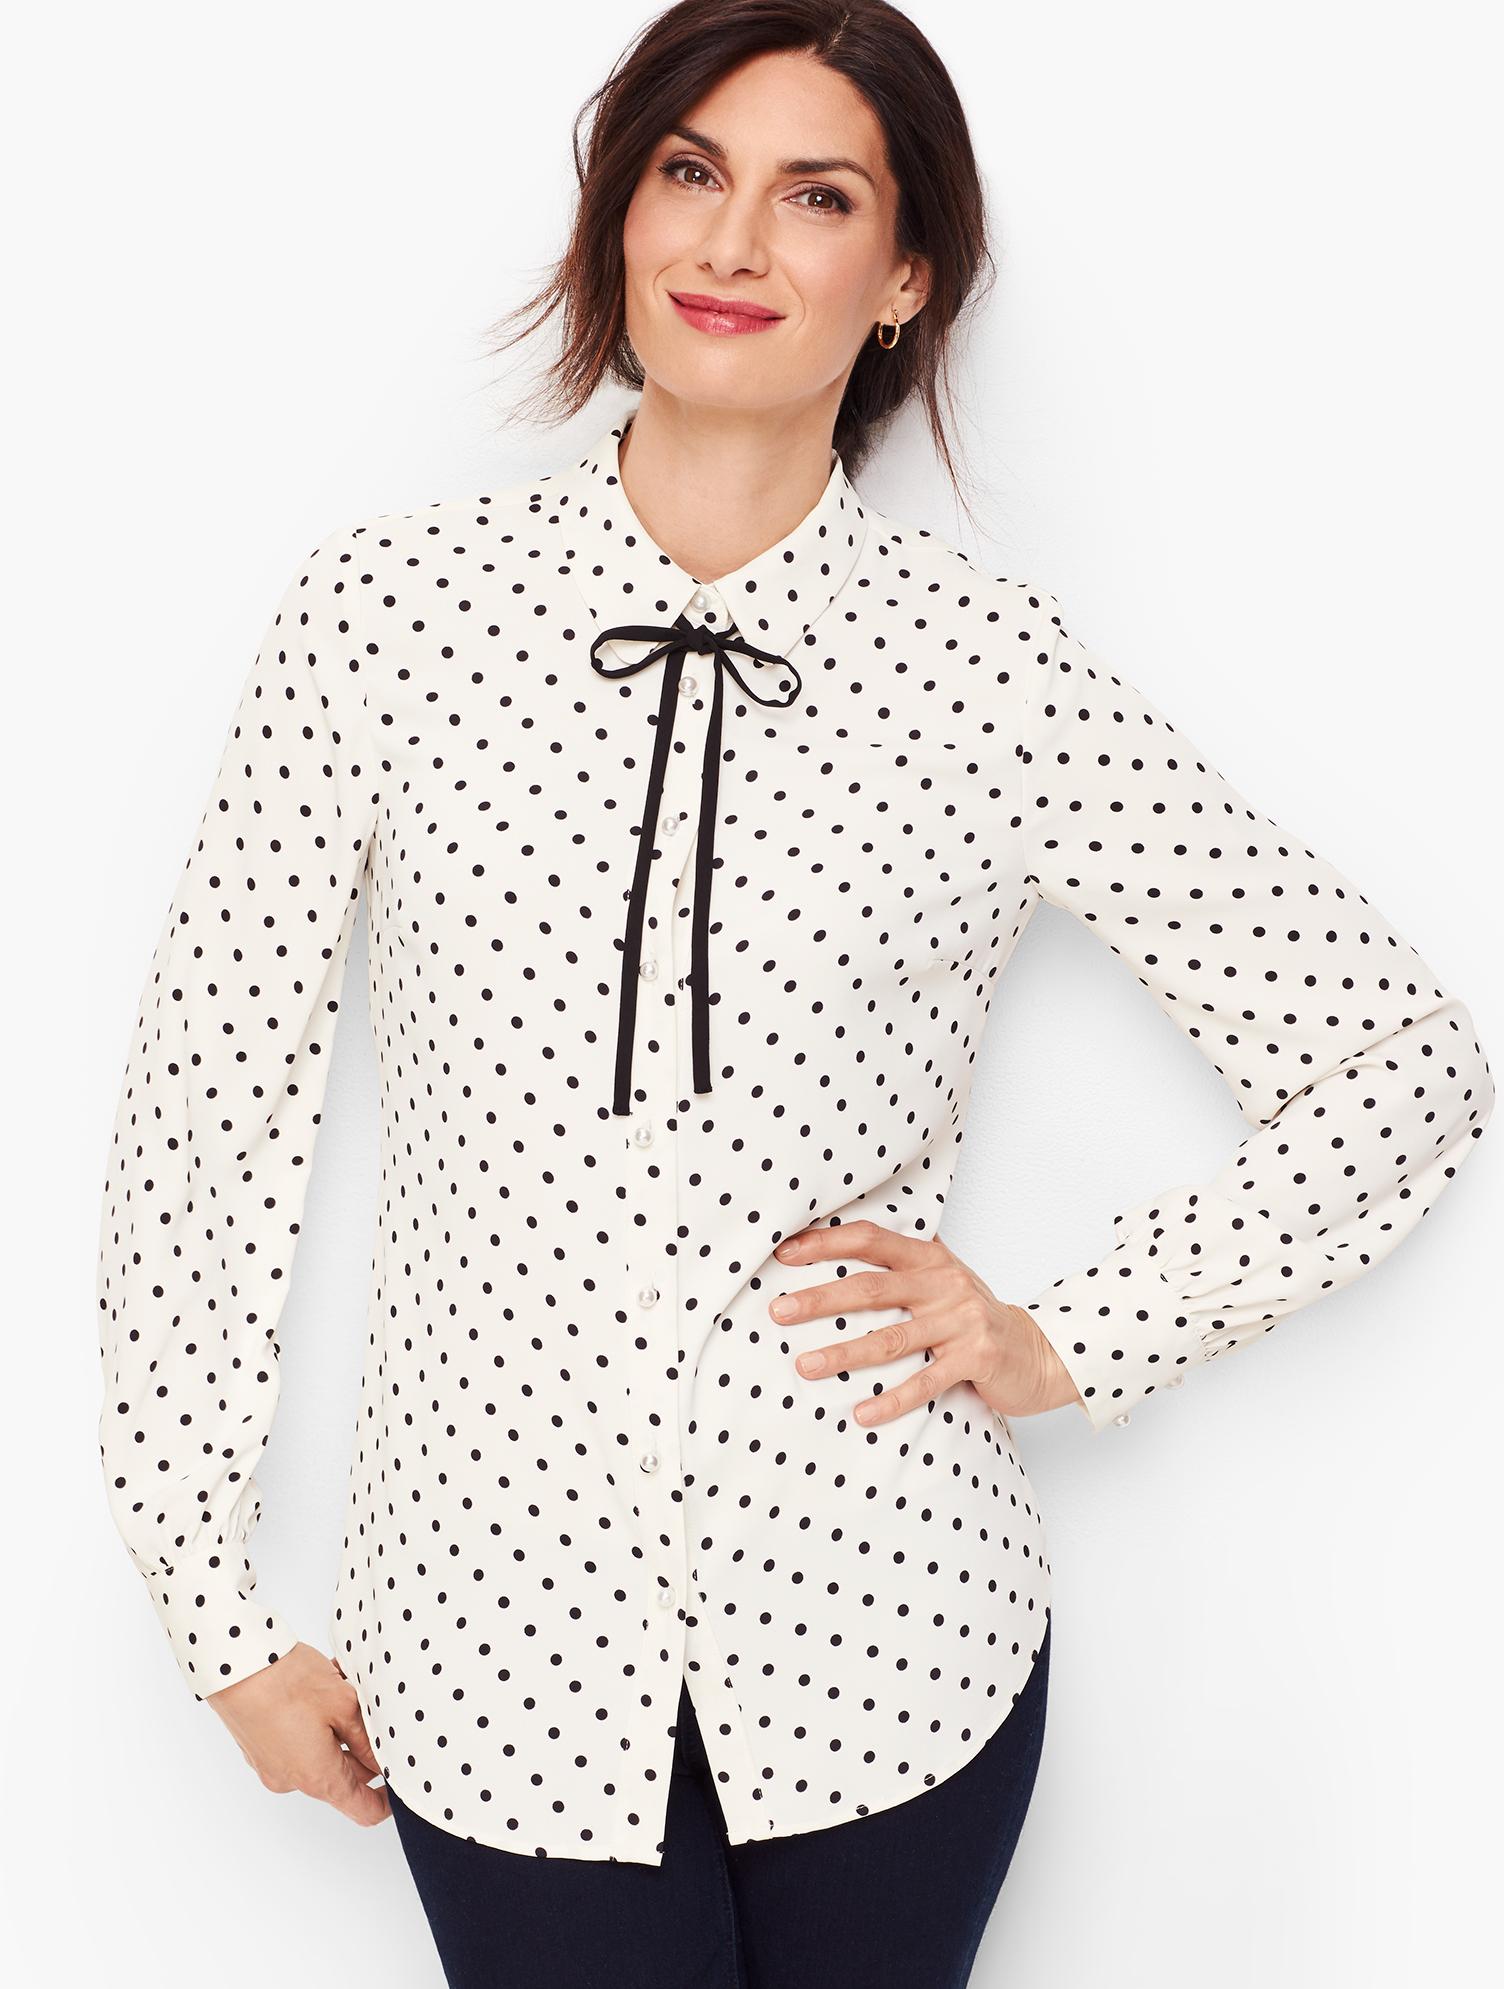 1930s Style Blouses, Shirts, Tops | Vintage Blouses Pearl Button Dot Shirt - IVORYBLACK - XL - Talbots $37.59 AT vintagedancer.com